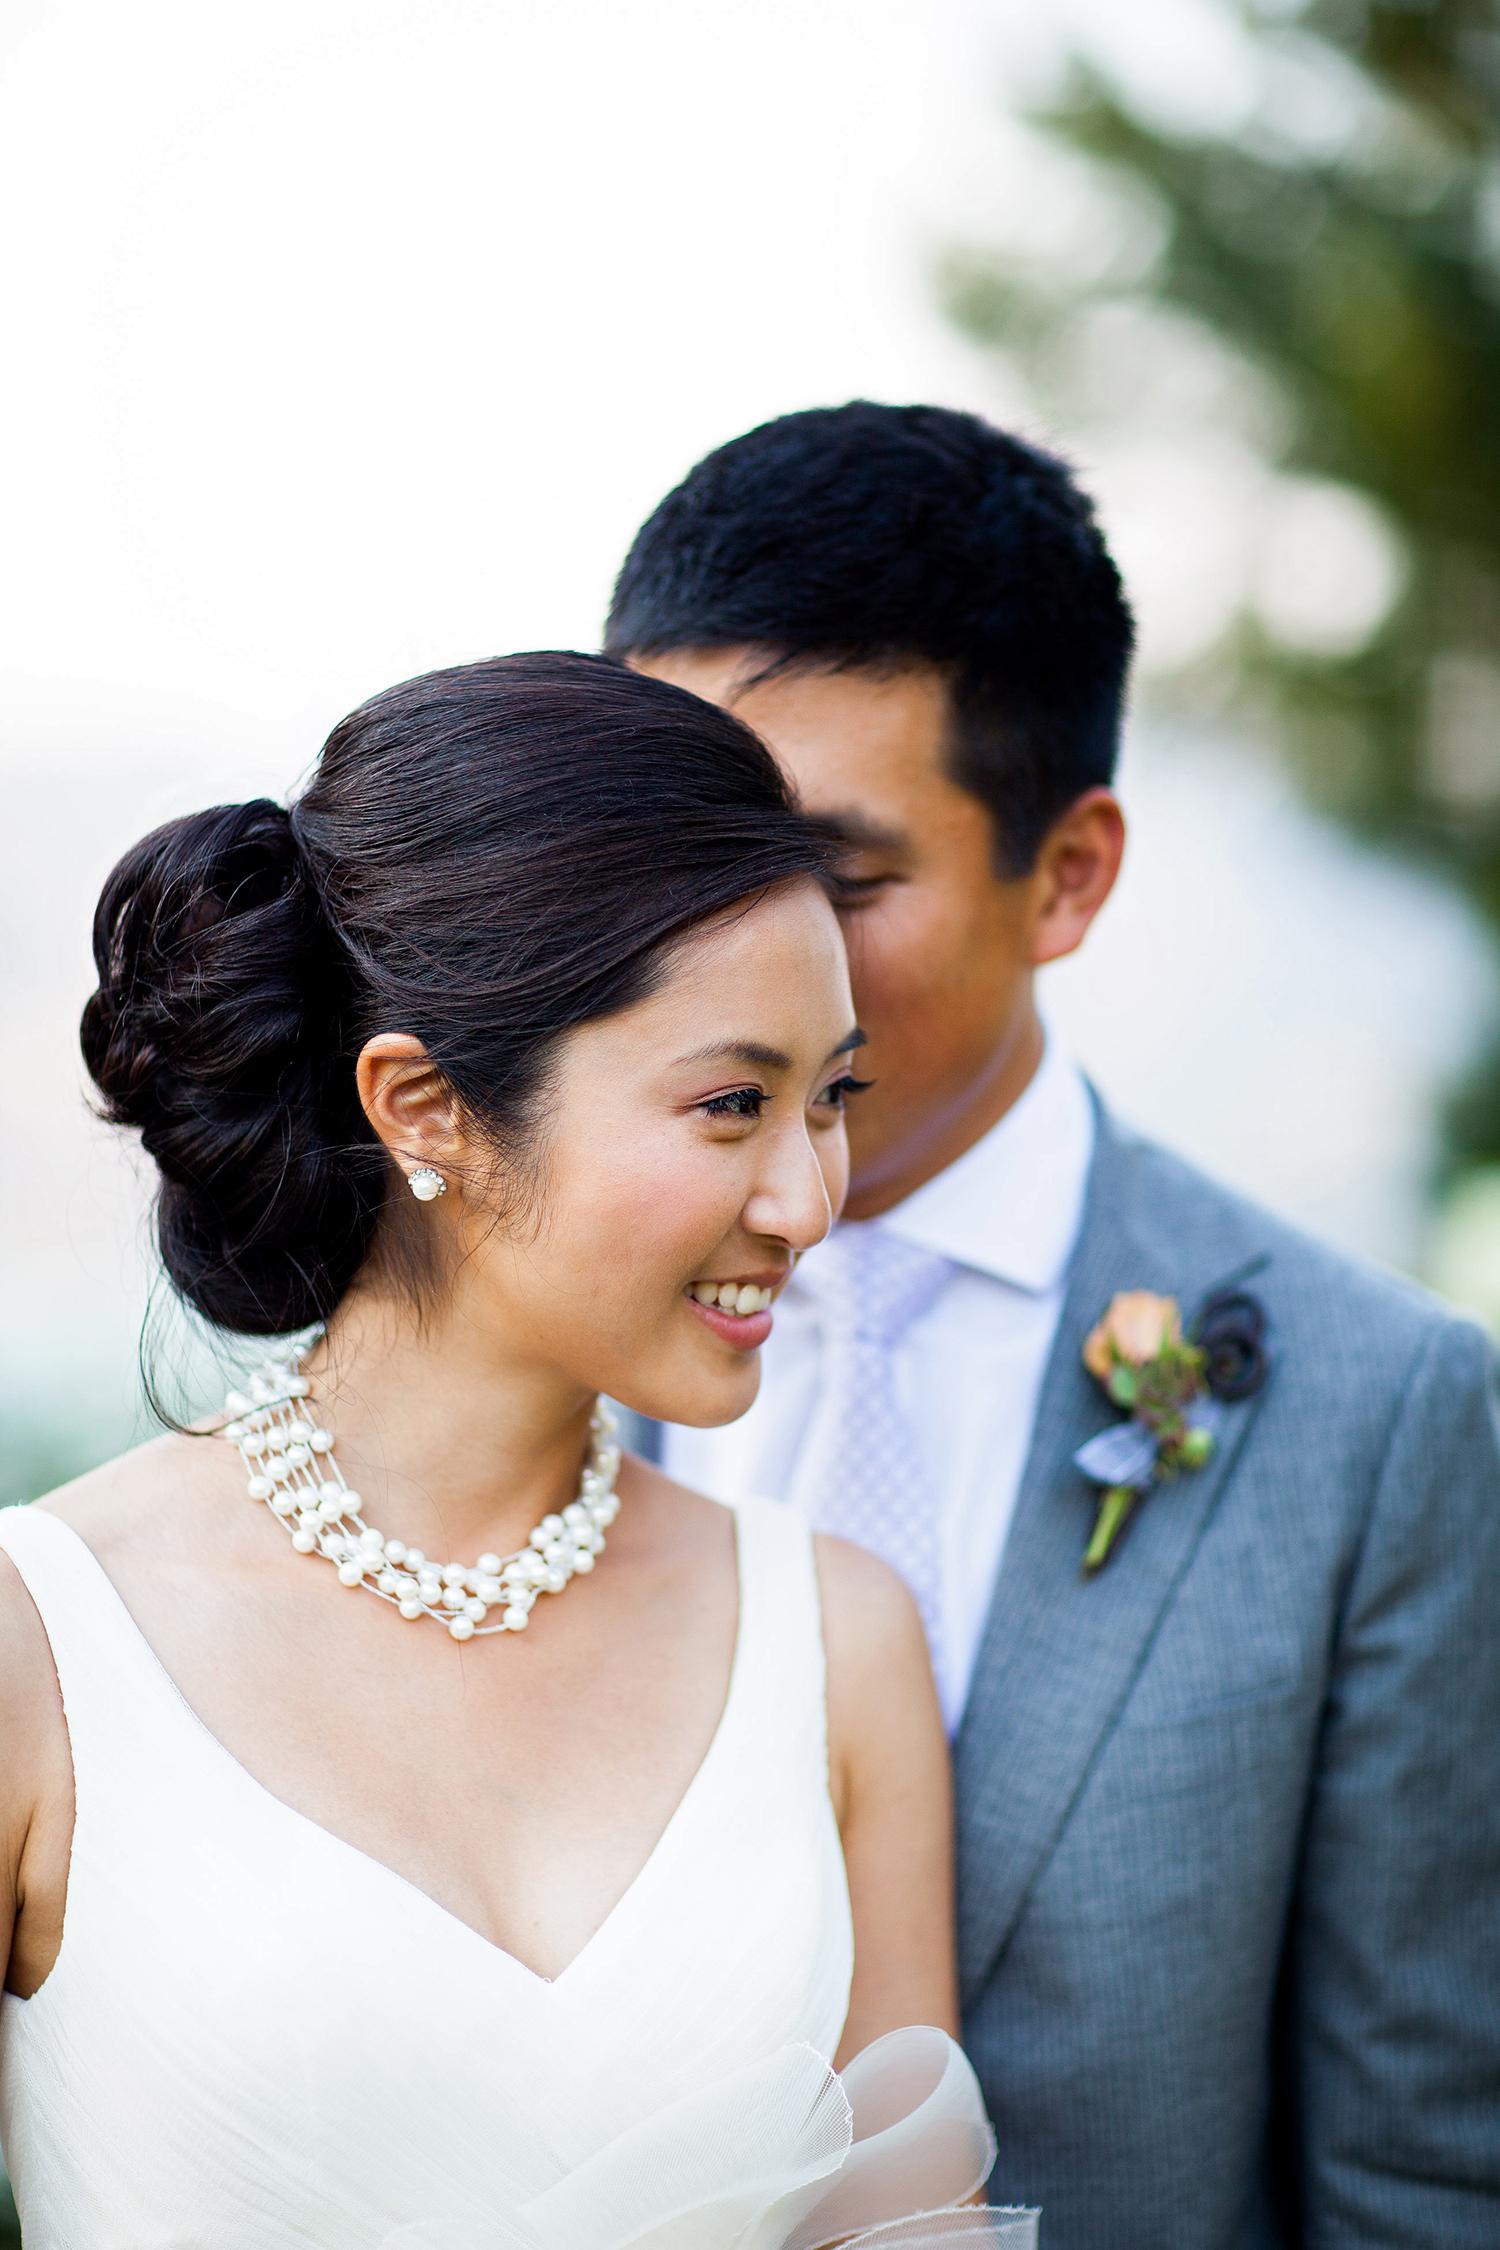 bride with v-neck dress and side bun